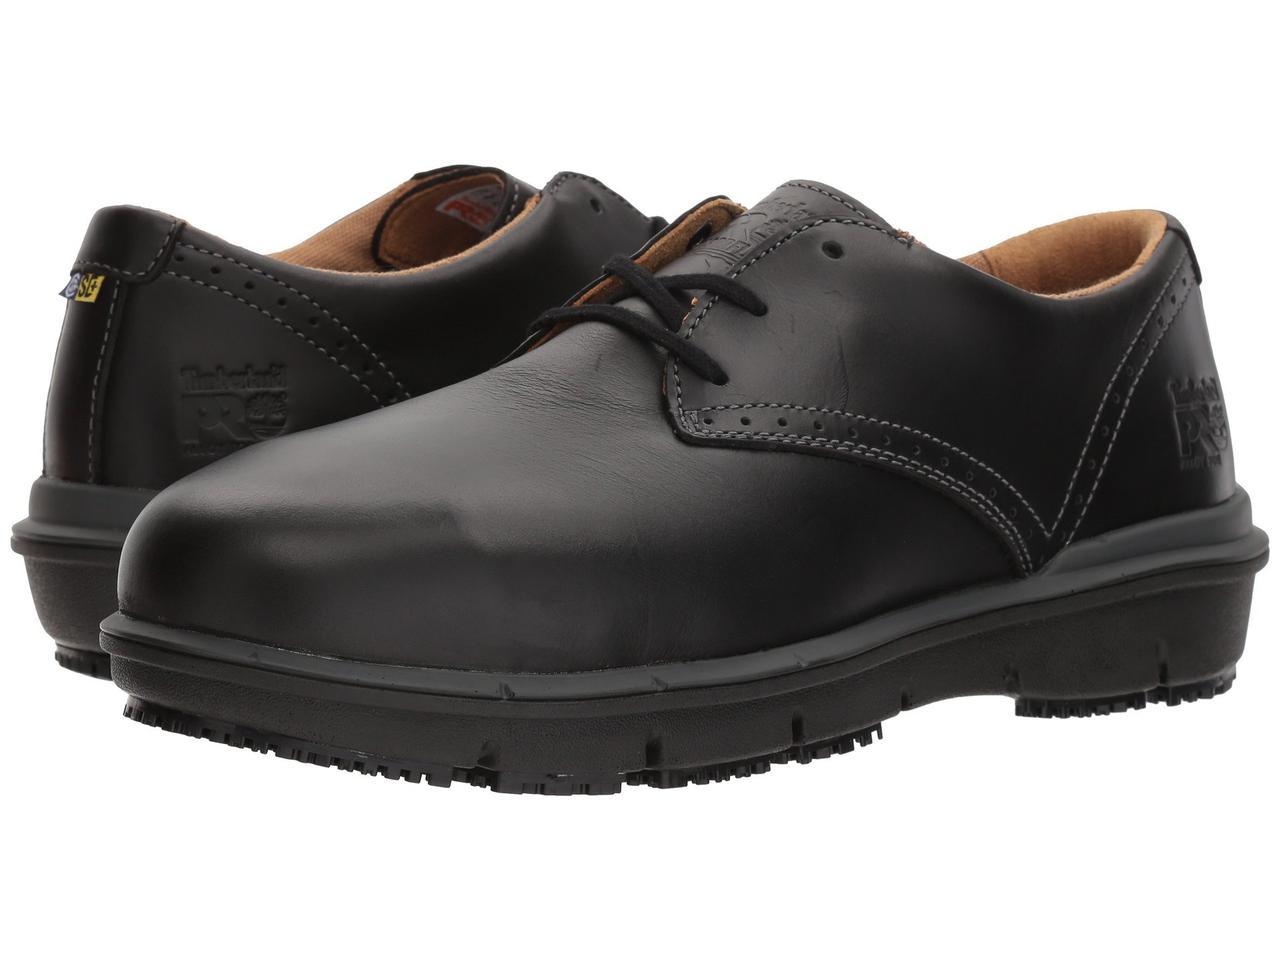 Туфли (Оригинал) Timberland PRO Boldon Oxford Alloy Safety Toe SD Black Full Grain Leather